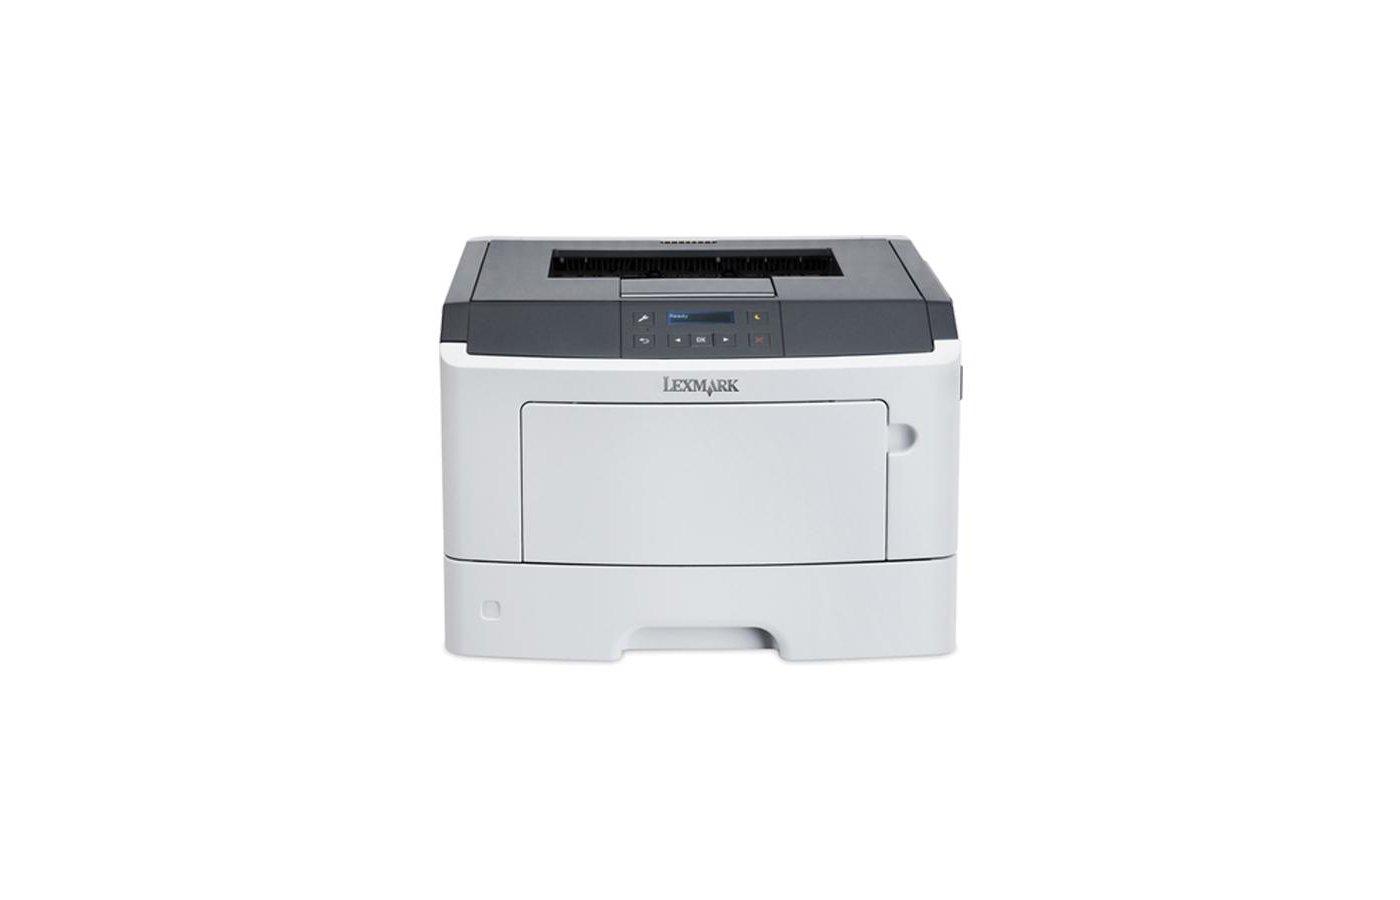 Принтер Lexmark MS312dn /35S0080/